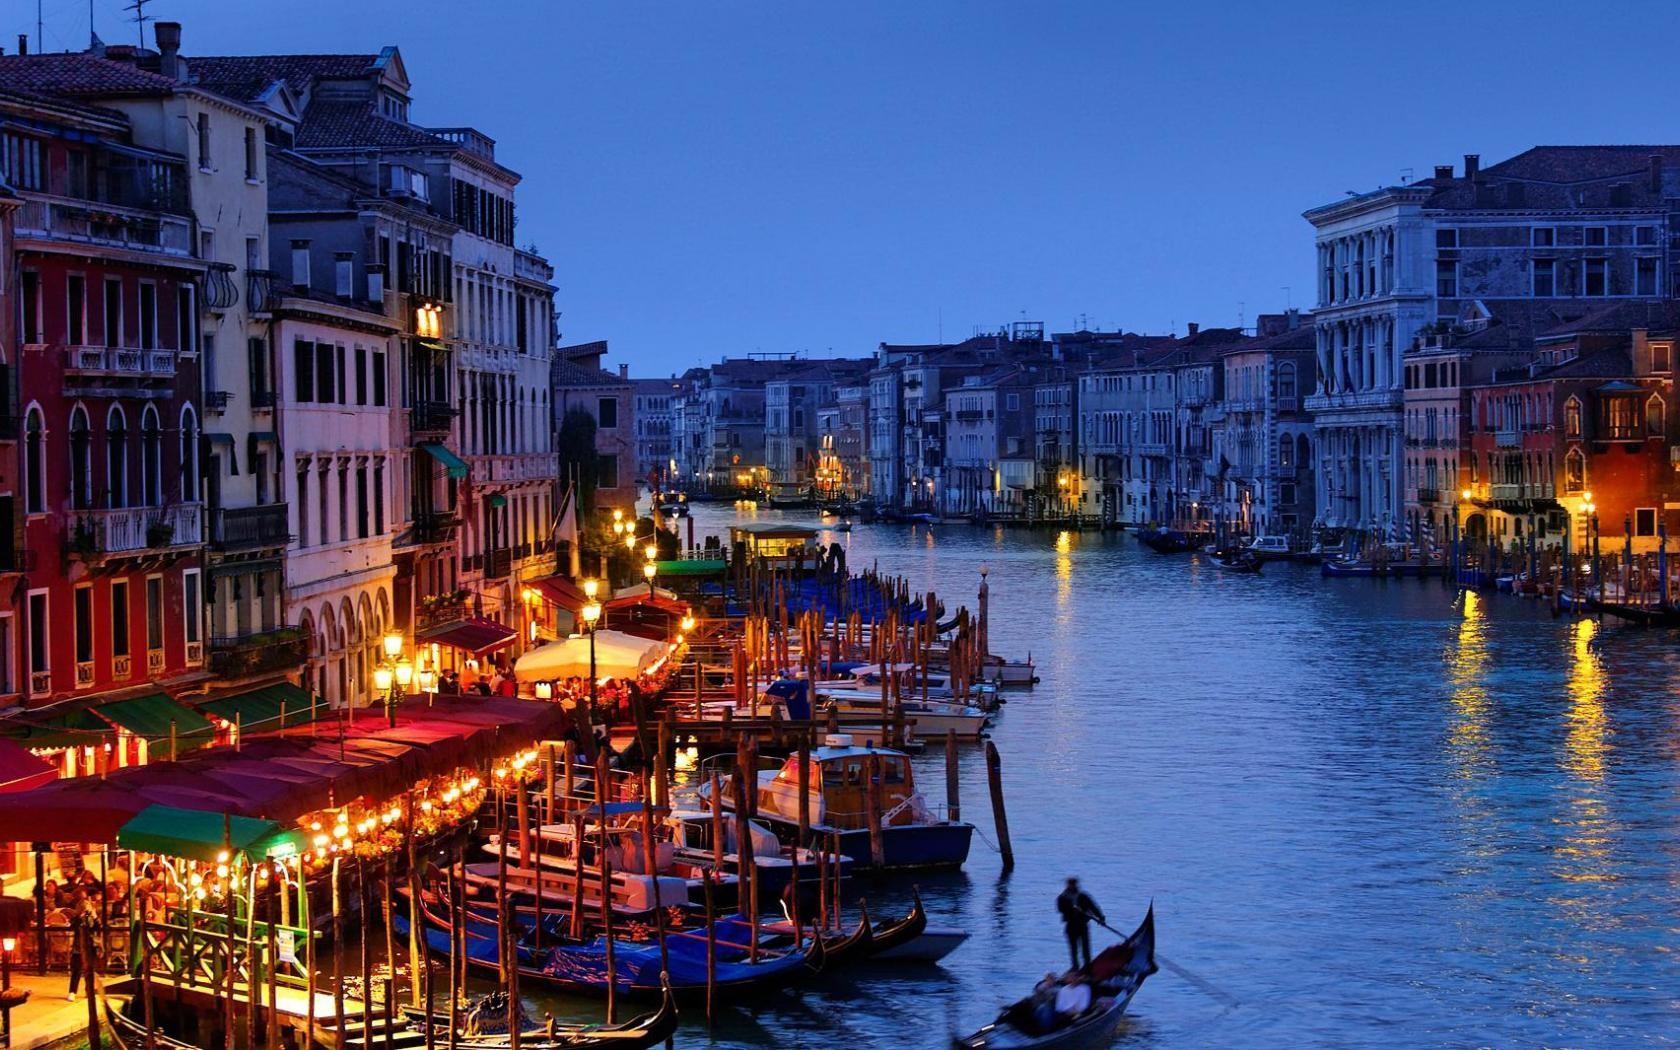 Venice Gondola Romantic Wallpaper Cool Awesome Houses 1680x1050